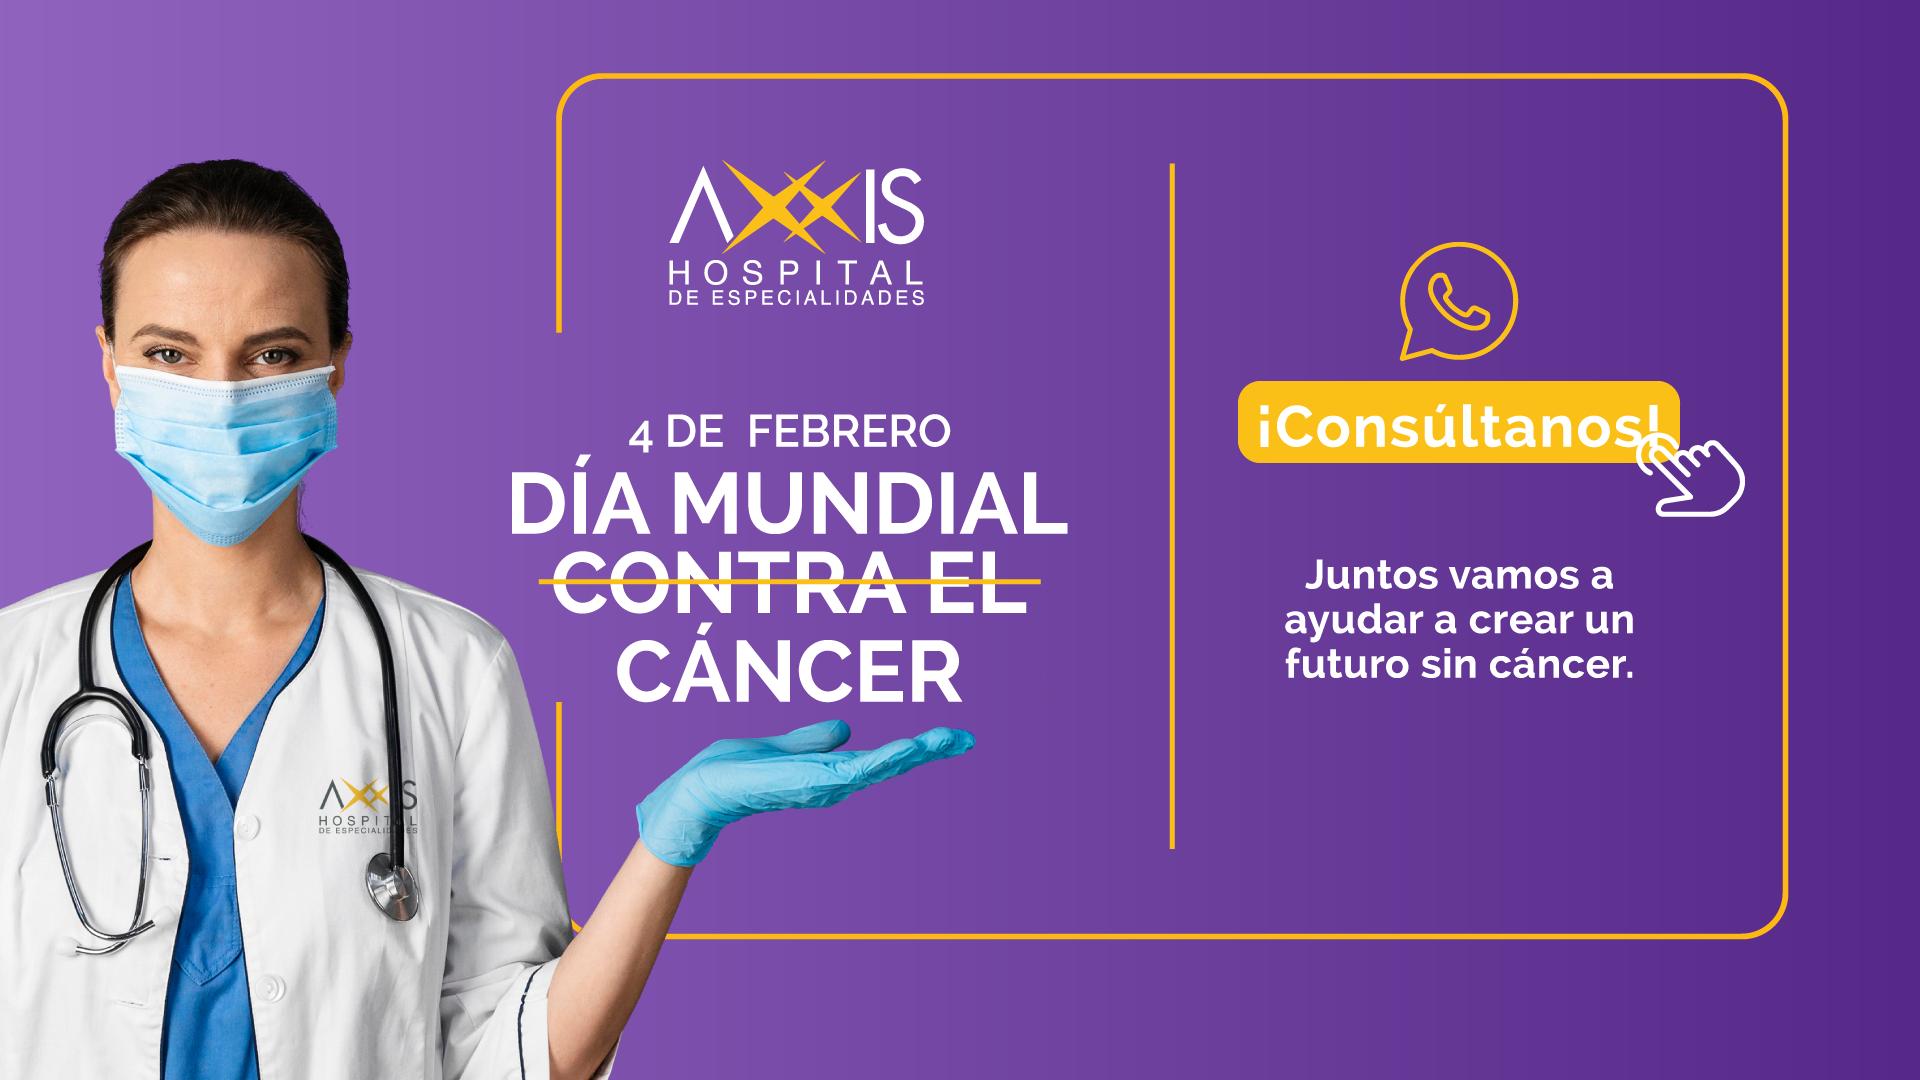 https://www.axxishospital.com.ec/wp-content/uploads/2021/01/Landing-cancer-1920x1080.png